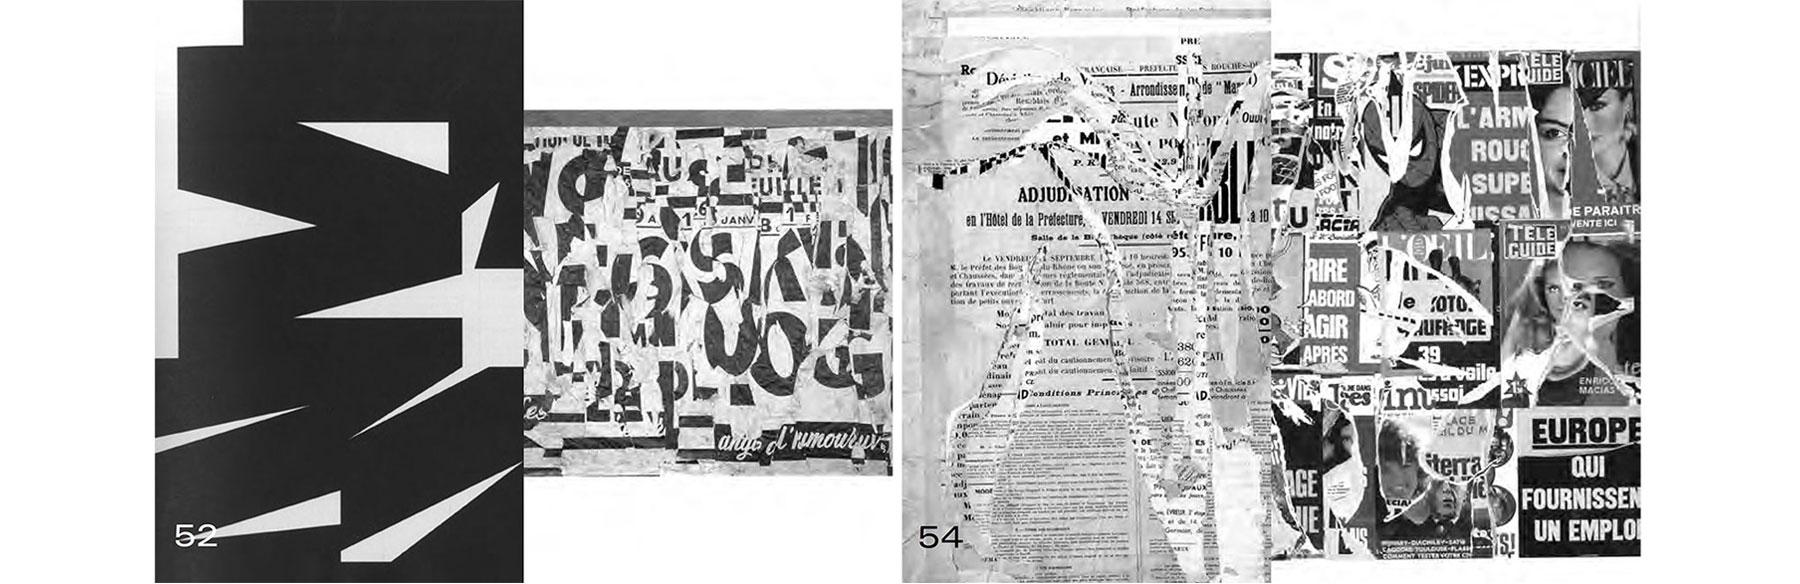 Ligatures-Daniel-Hattenschwiller-Thomas-Petit-cover-index-grafik-memoire-ecal-capture02